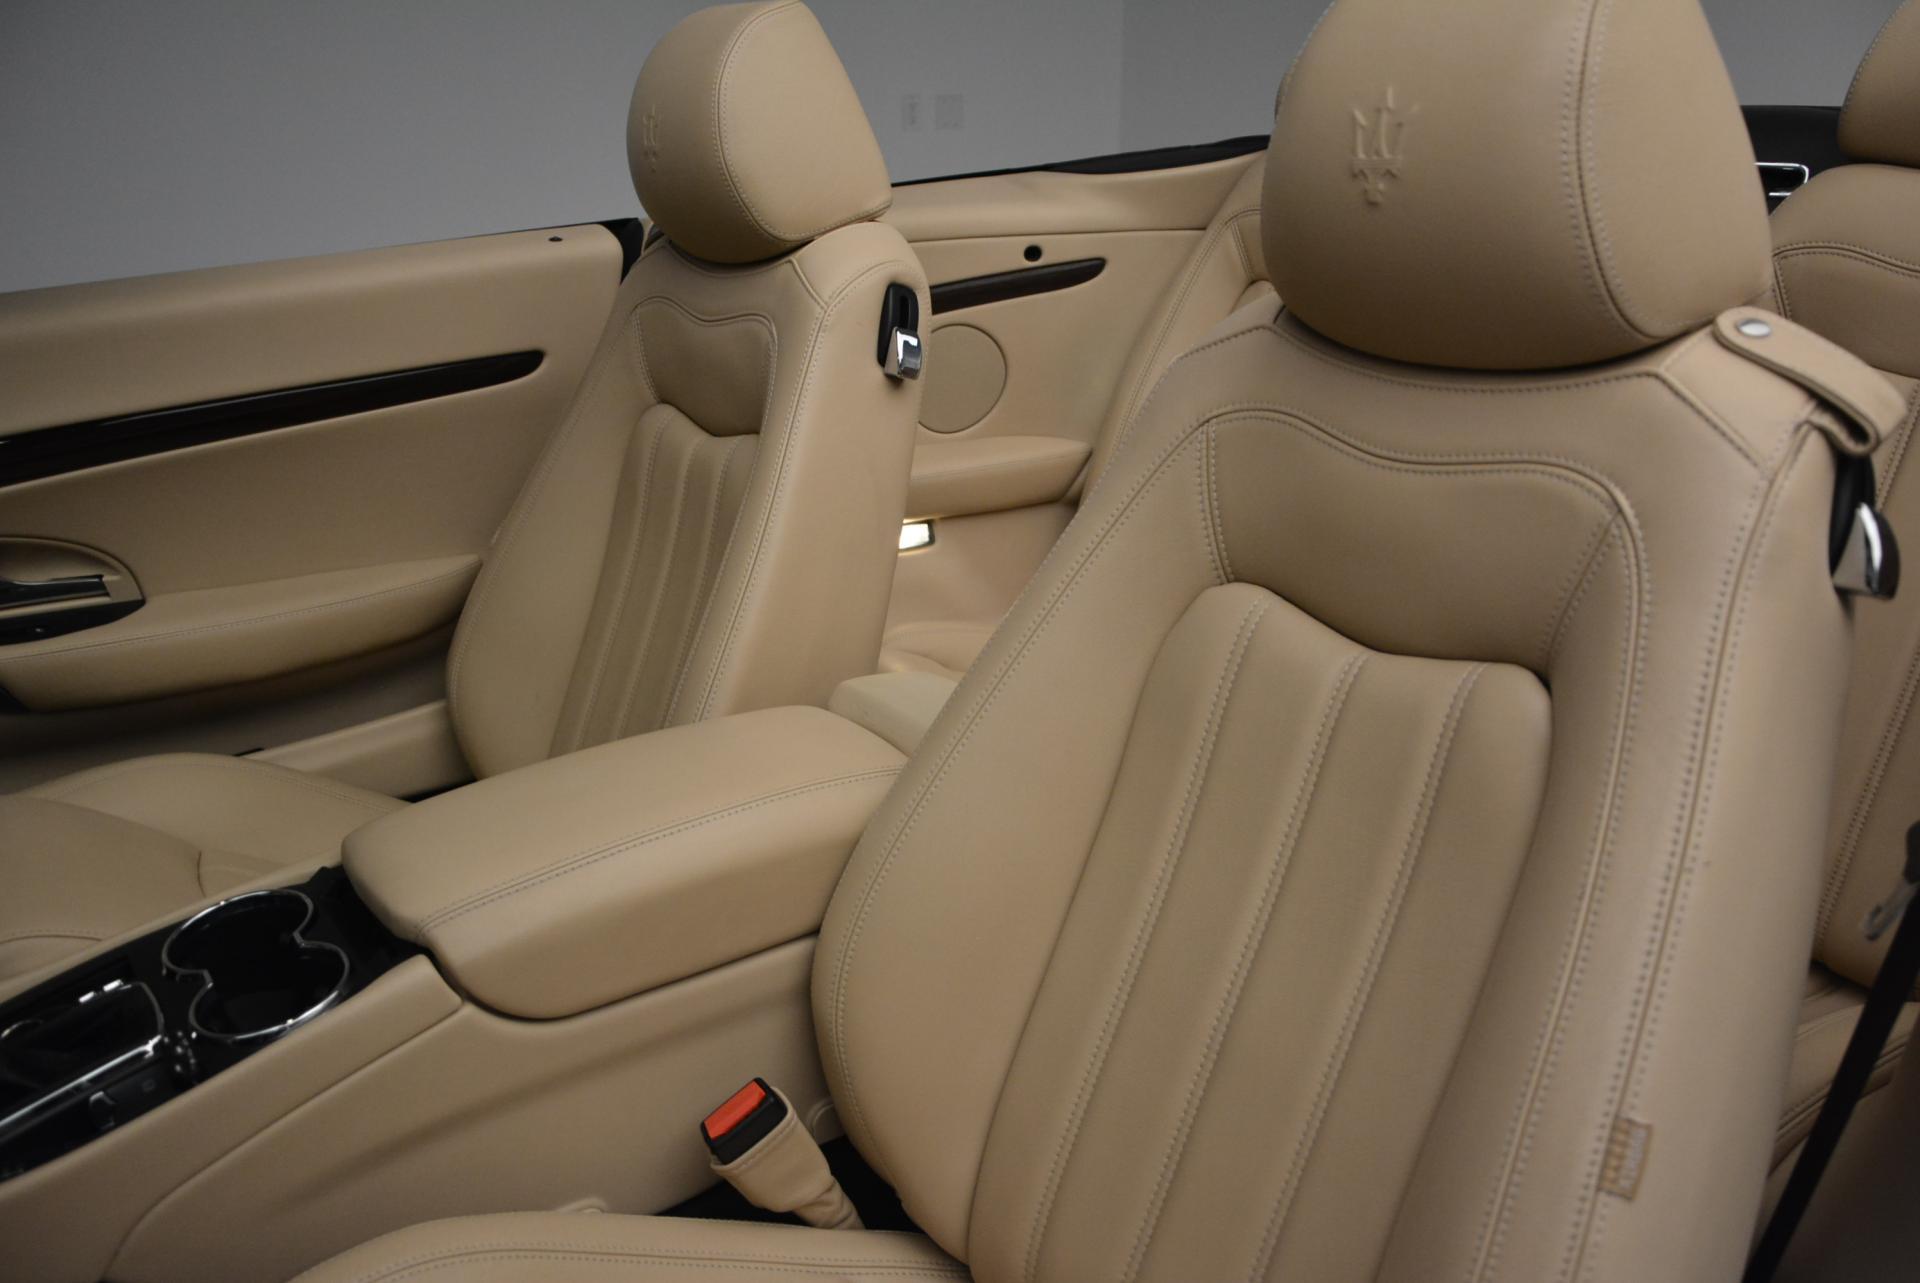 Used 2011 Maserati GranTurismo Base For Sale In Westport, CT 158_p25